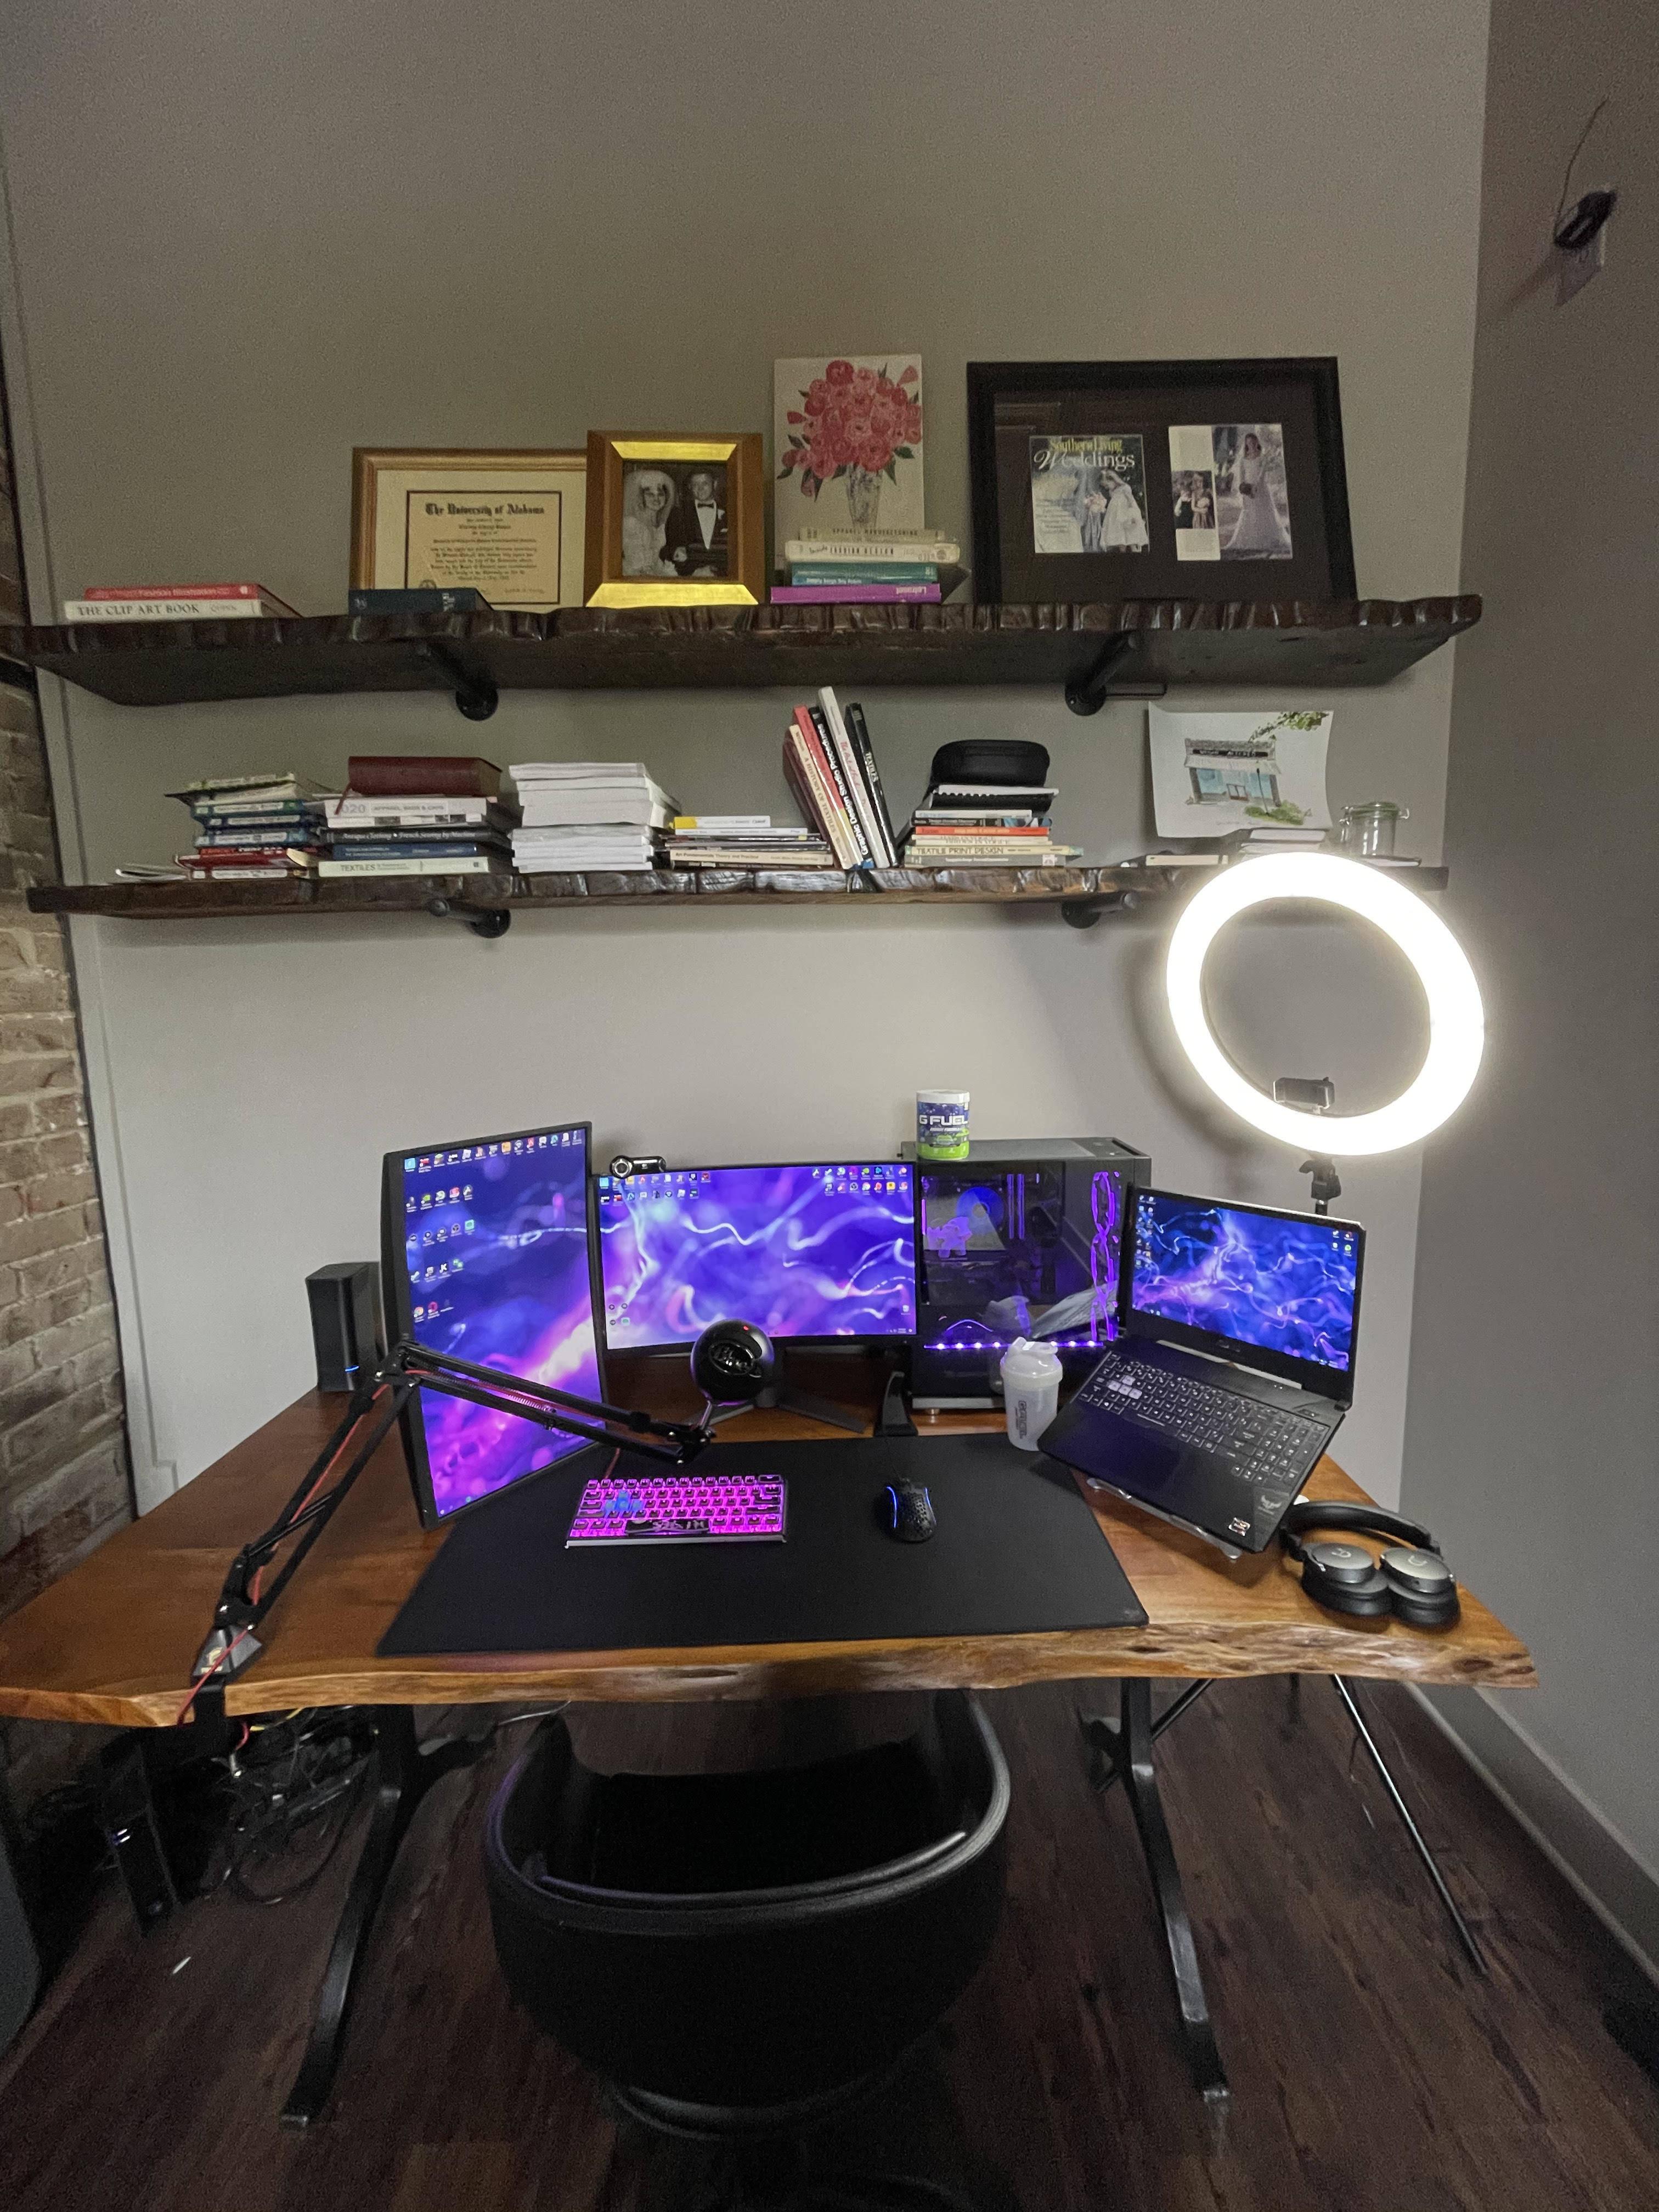 ExhaleFN's Setup - My Fortnite Gaming Setup | Scooget